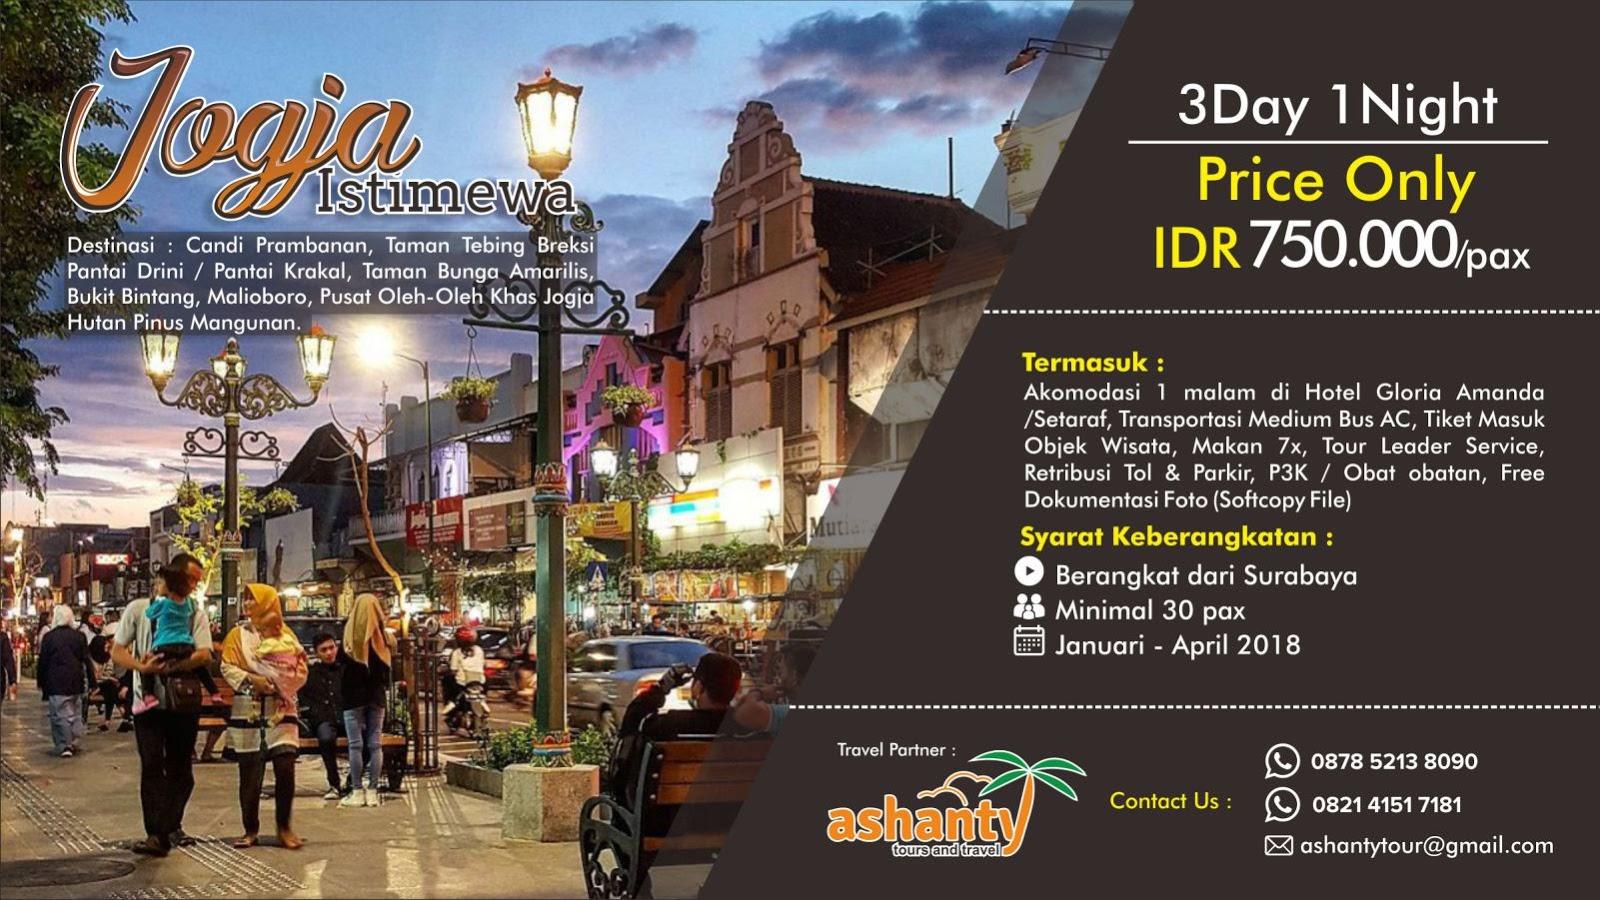 paket wisata surabaya jogja murah, liburan murah ke jogja dari surabaya, paket tour jogja 3 hari 2 malam dari surabaya